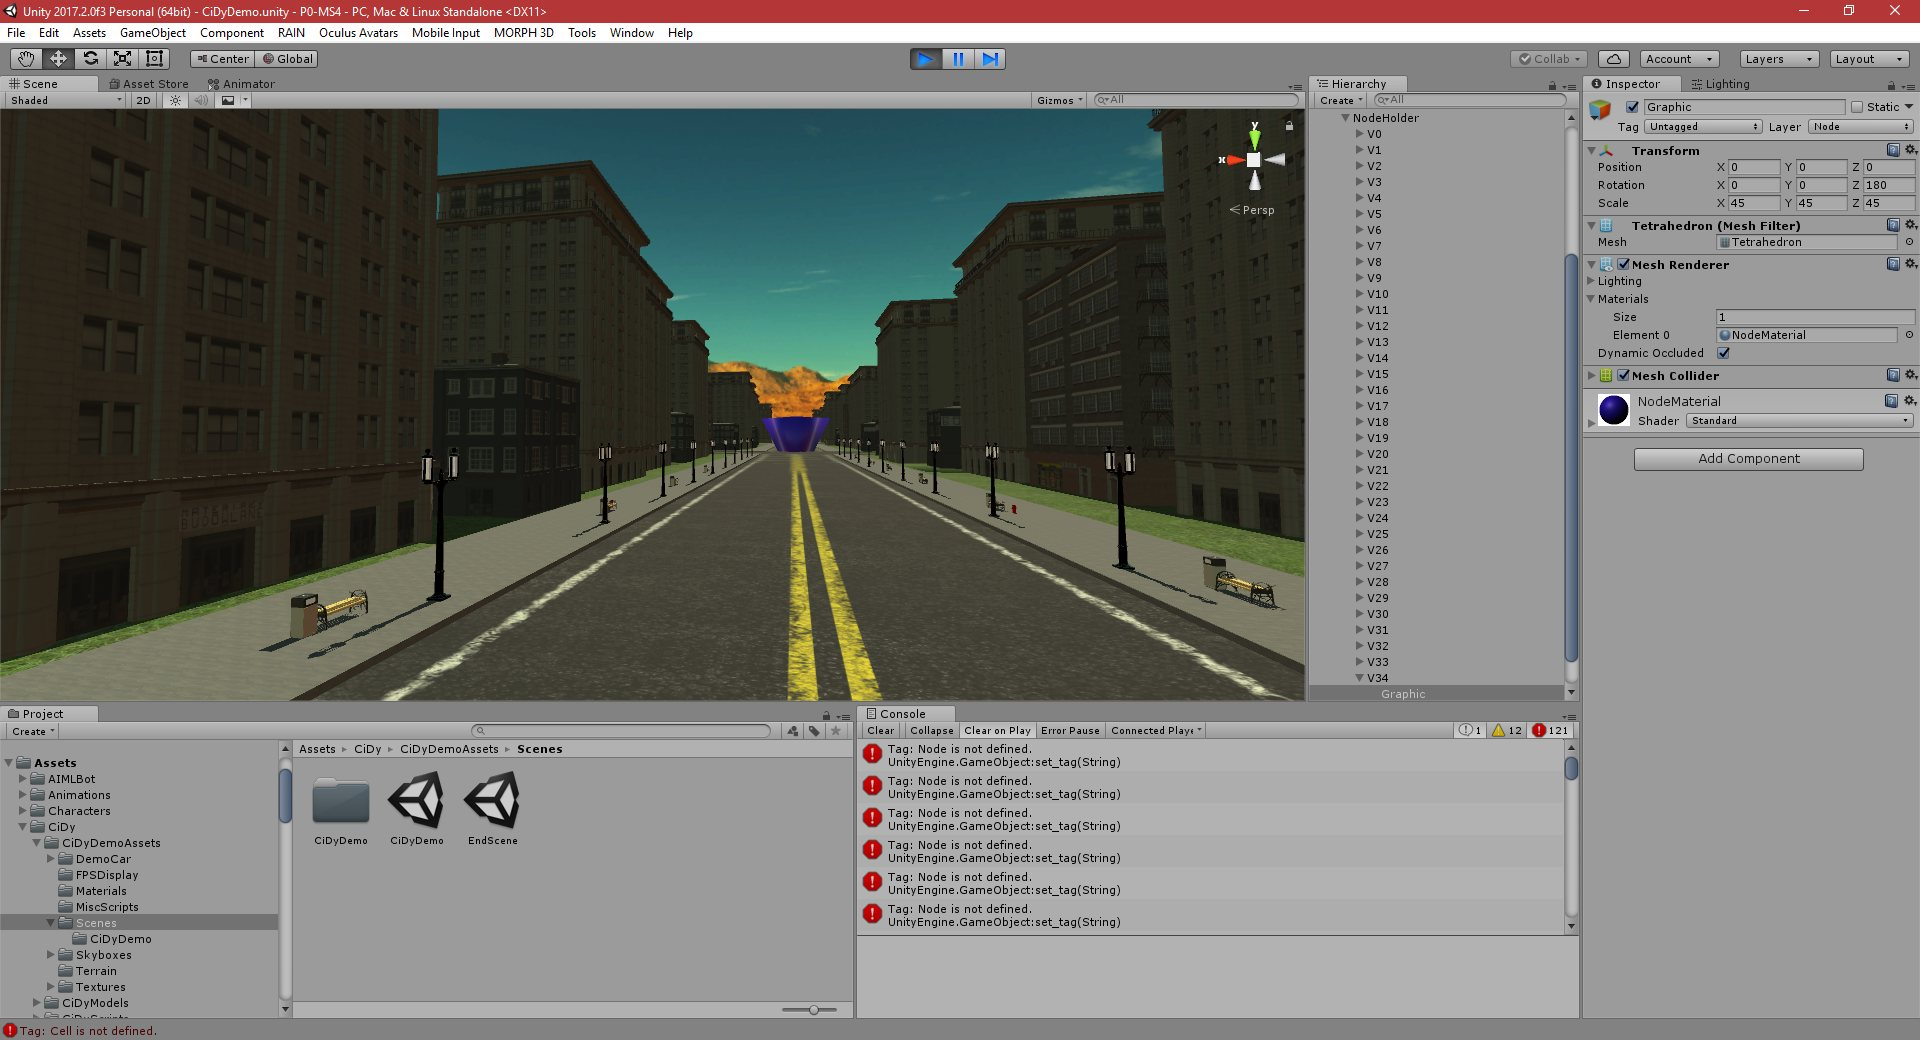 P0-MS5: Part 300: City Simulator - PGD Home